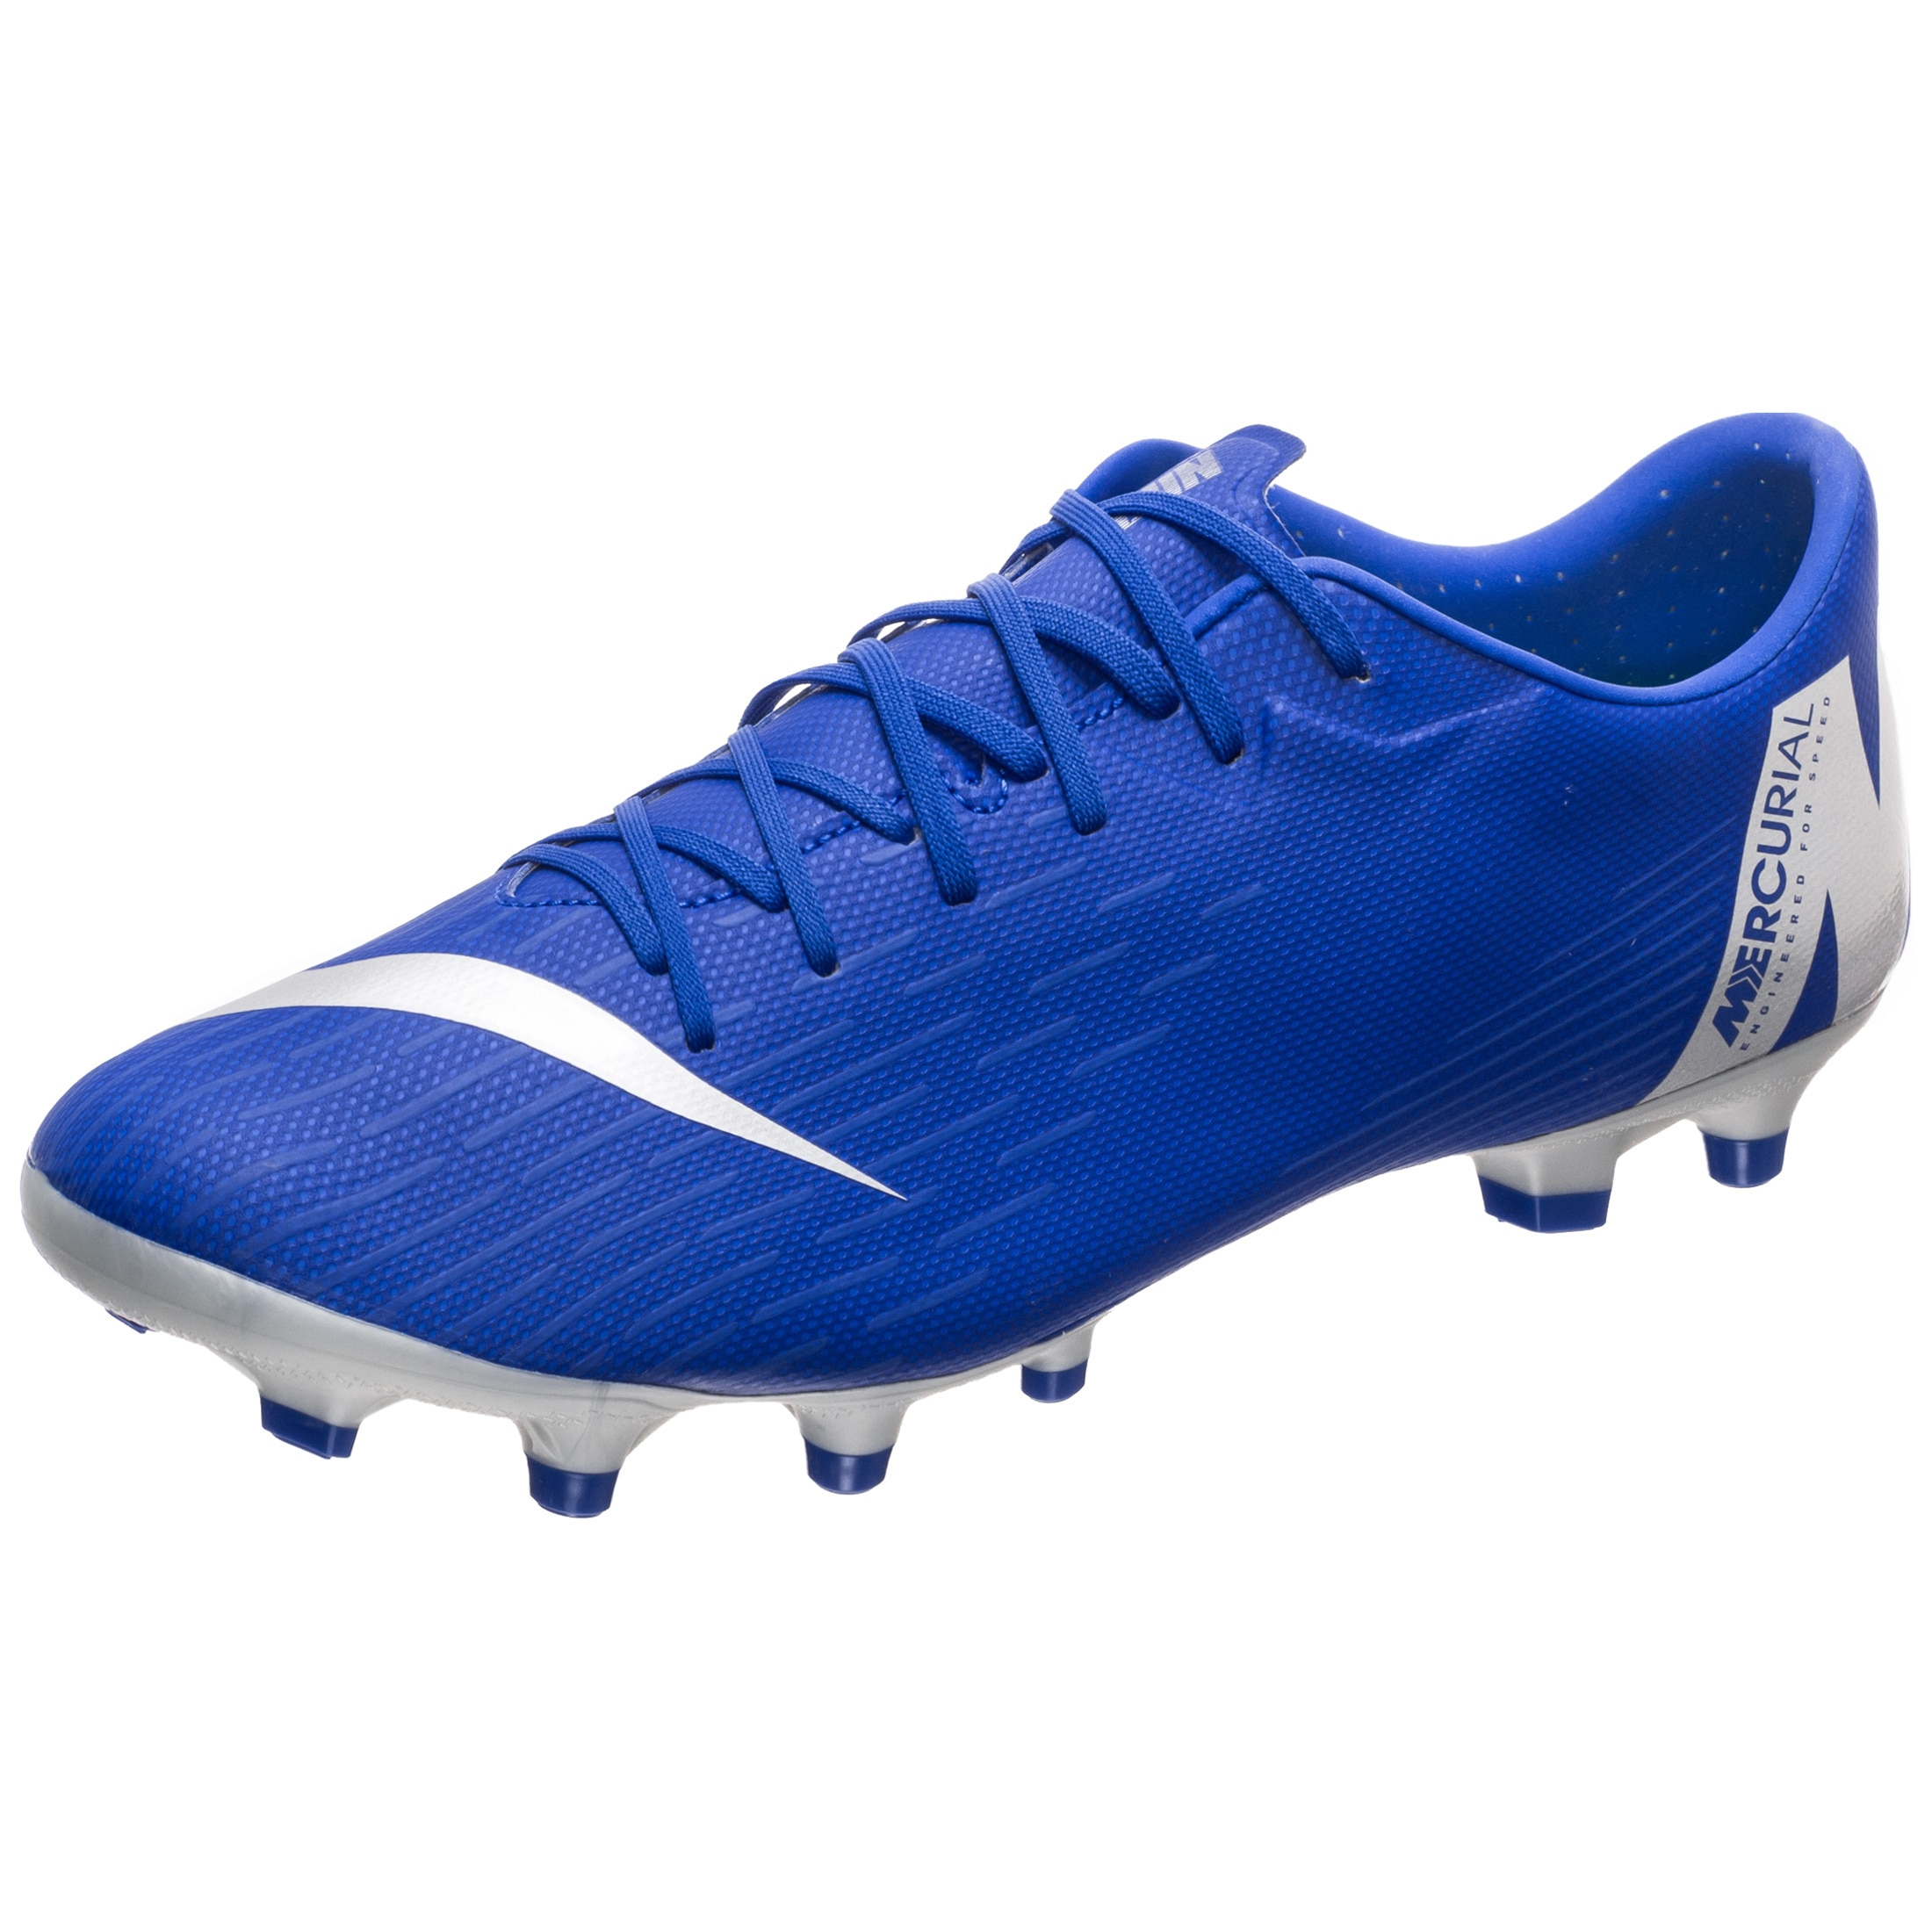 Nike Fußballschuh Mercurial Vapor Xii Academy | Schuhe > Sportschuhe > Fußballschuhe | Blau | Nike